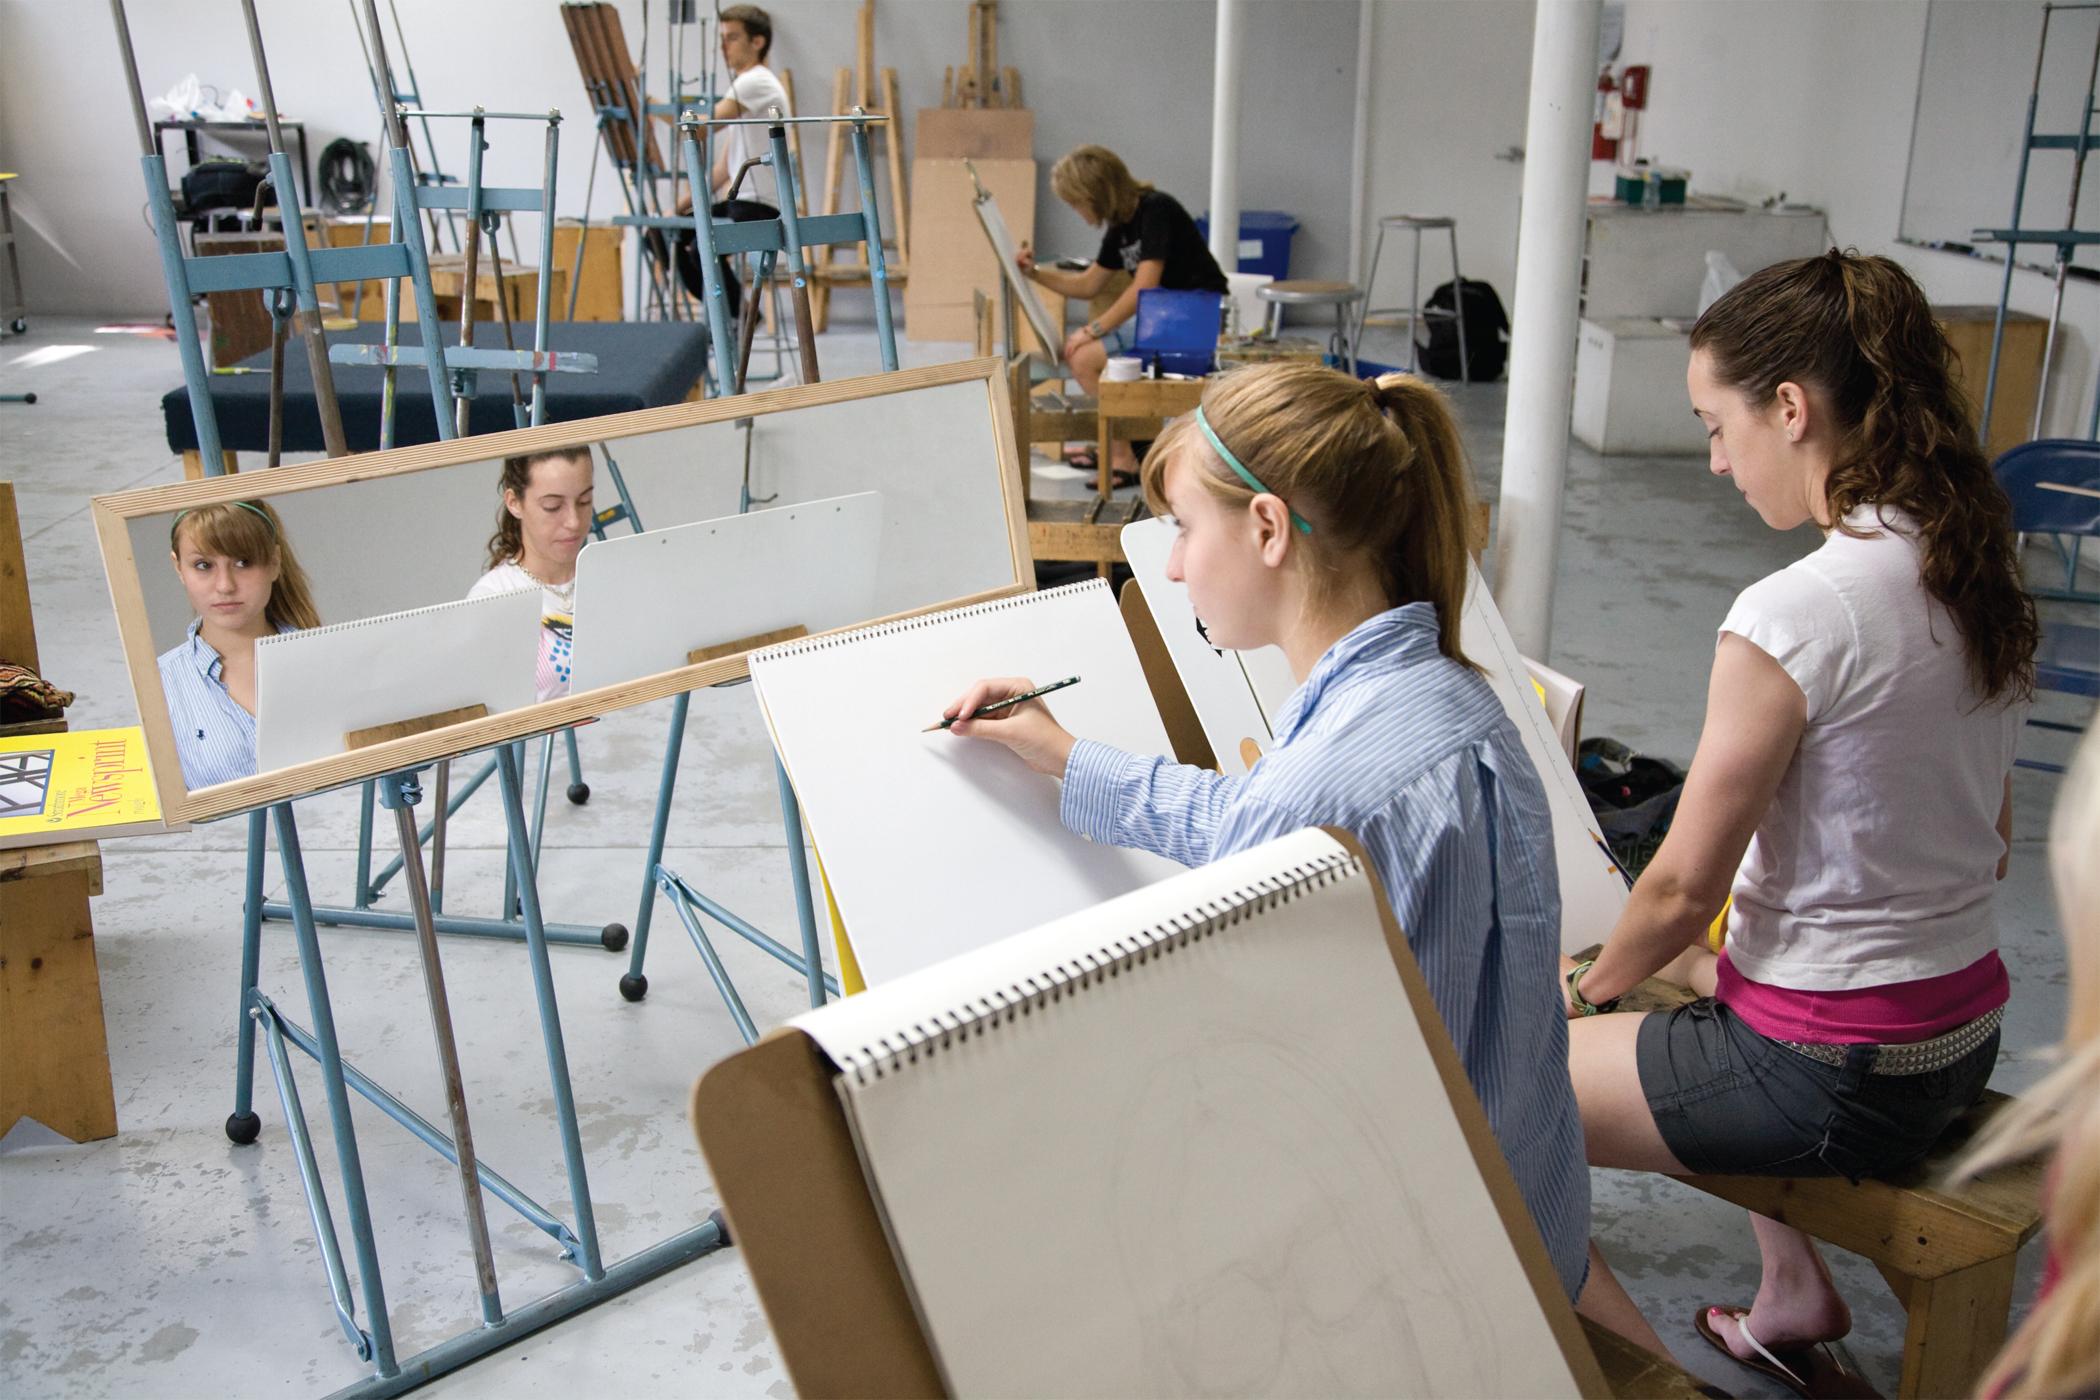 Teen Art Courses Question 88